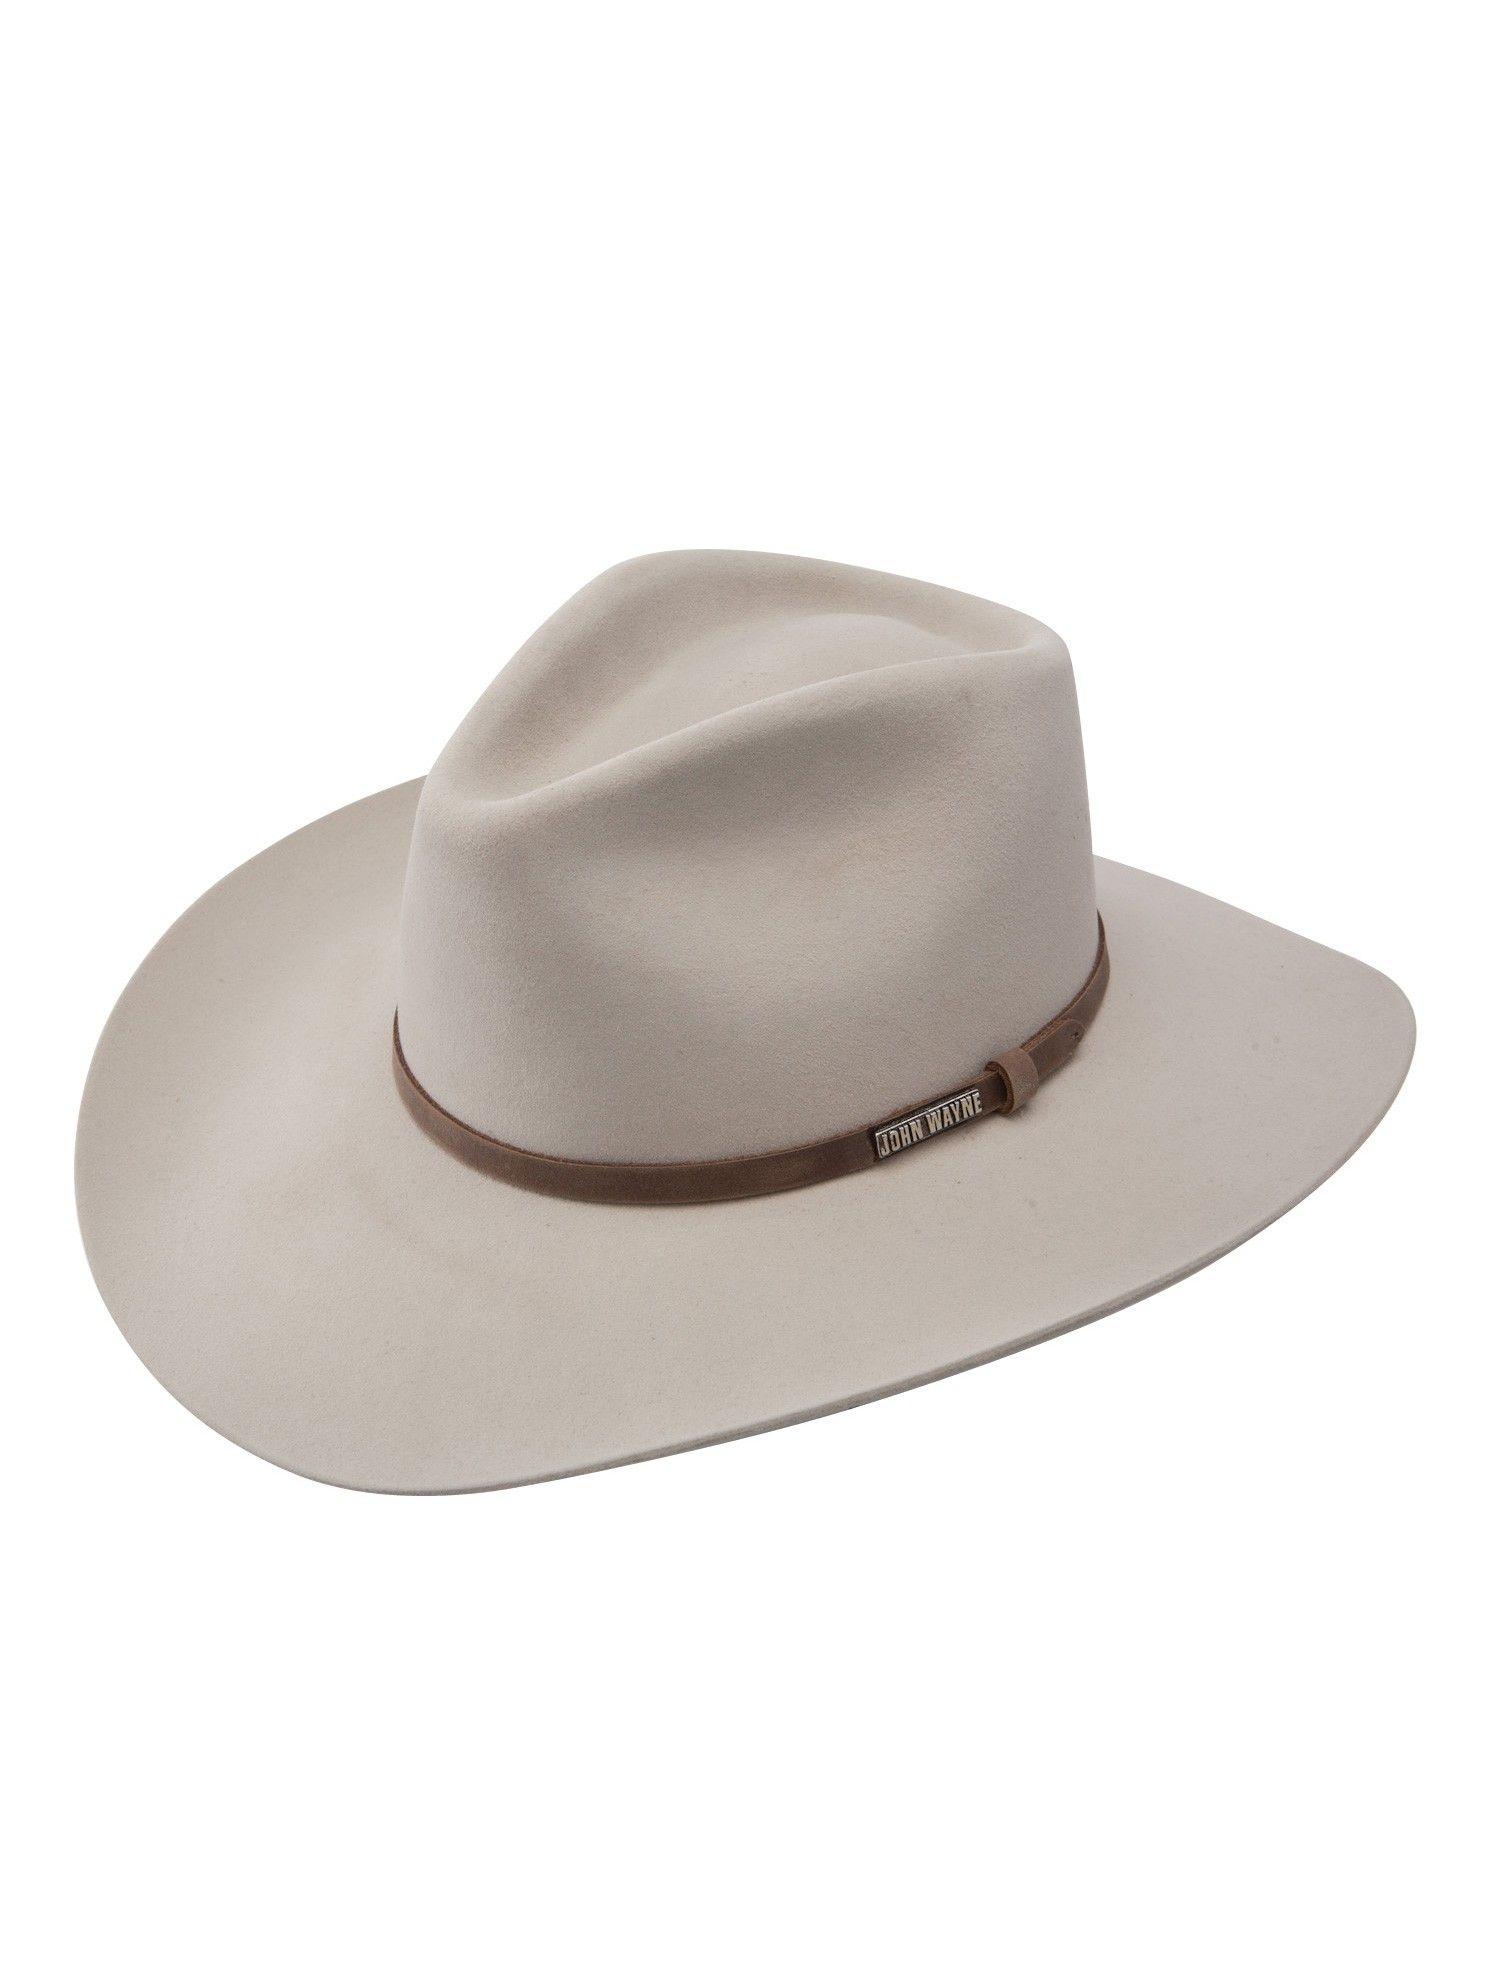 5462e7e2 John Wayne's Custom-Made Cowboy Hat | John Wayne in 2019 | Hats, Cowboy hats,  Resistol hats